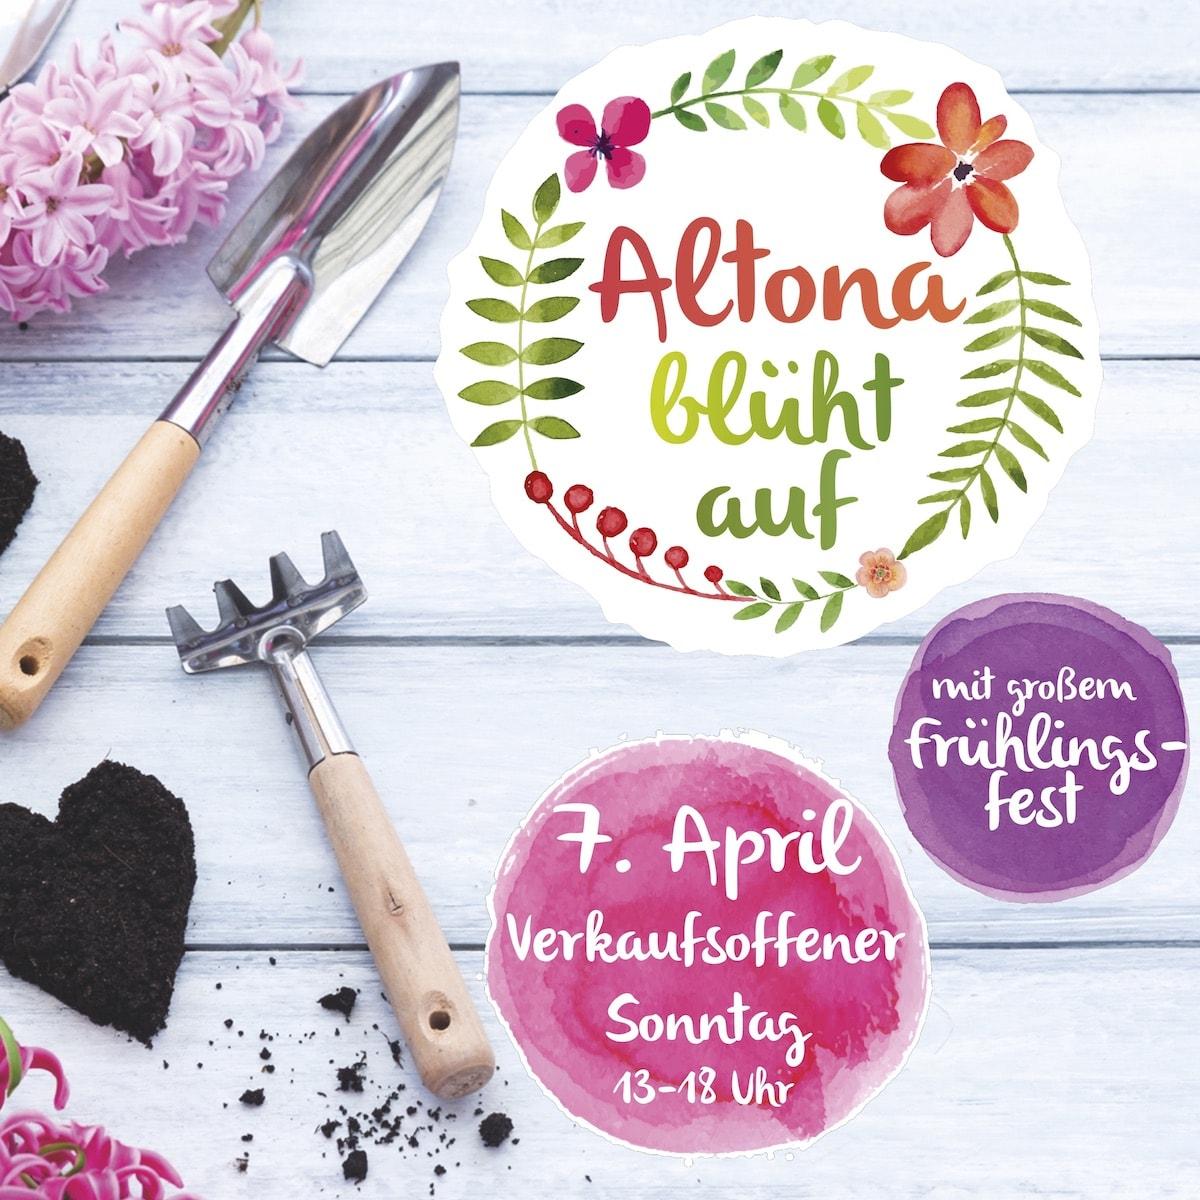 altona-blueht-auf